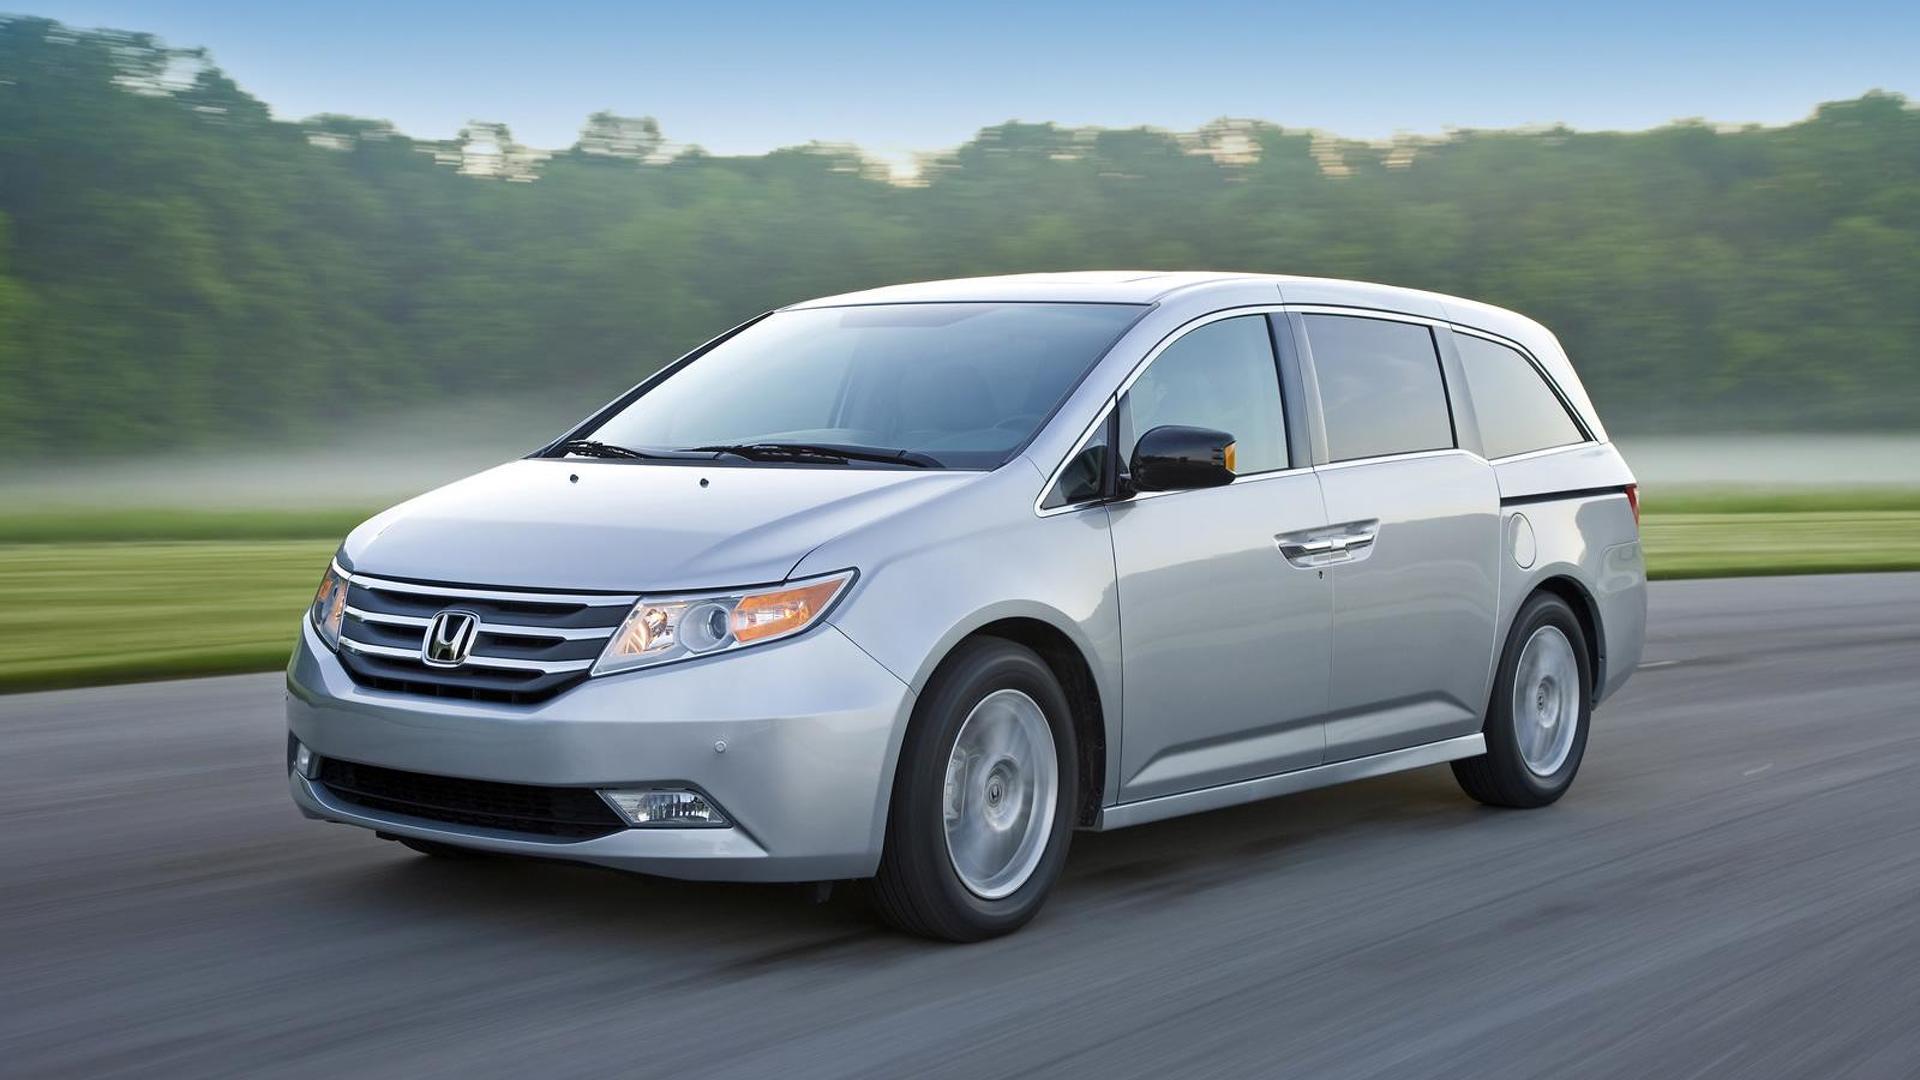 2011 Honda Odyssey Touring Elite minivan revealed